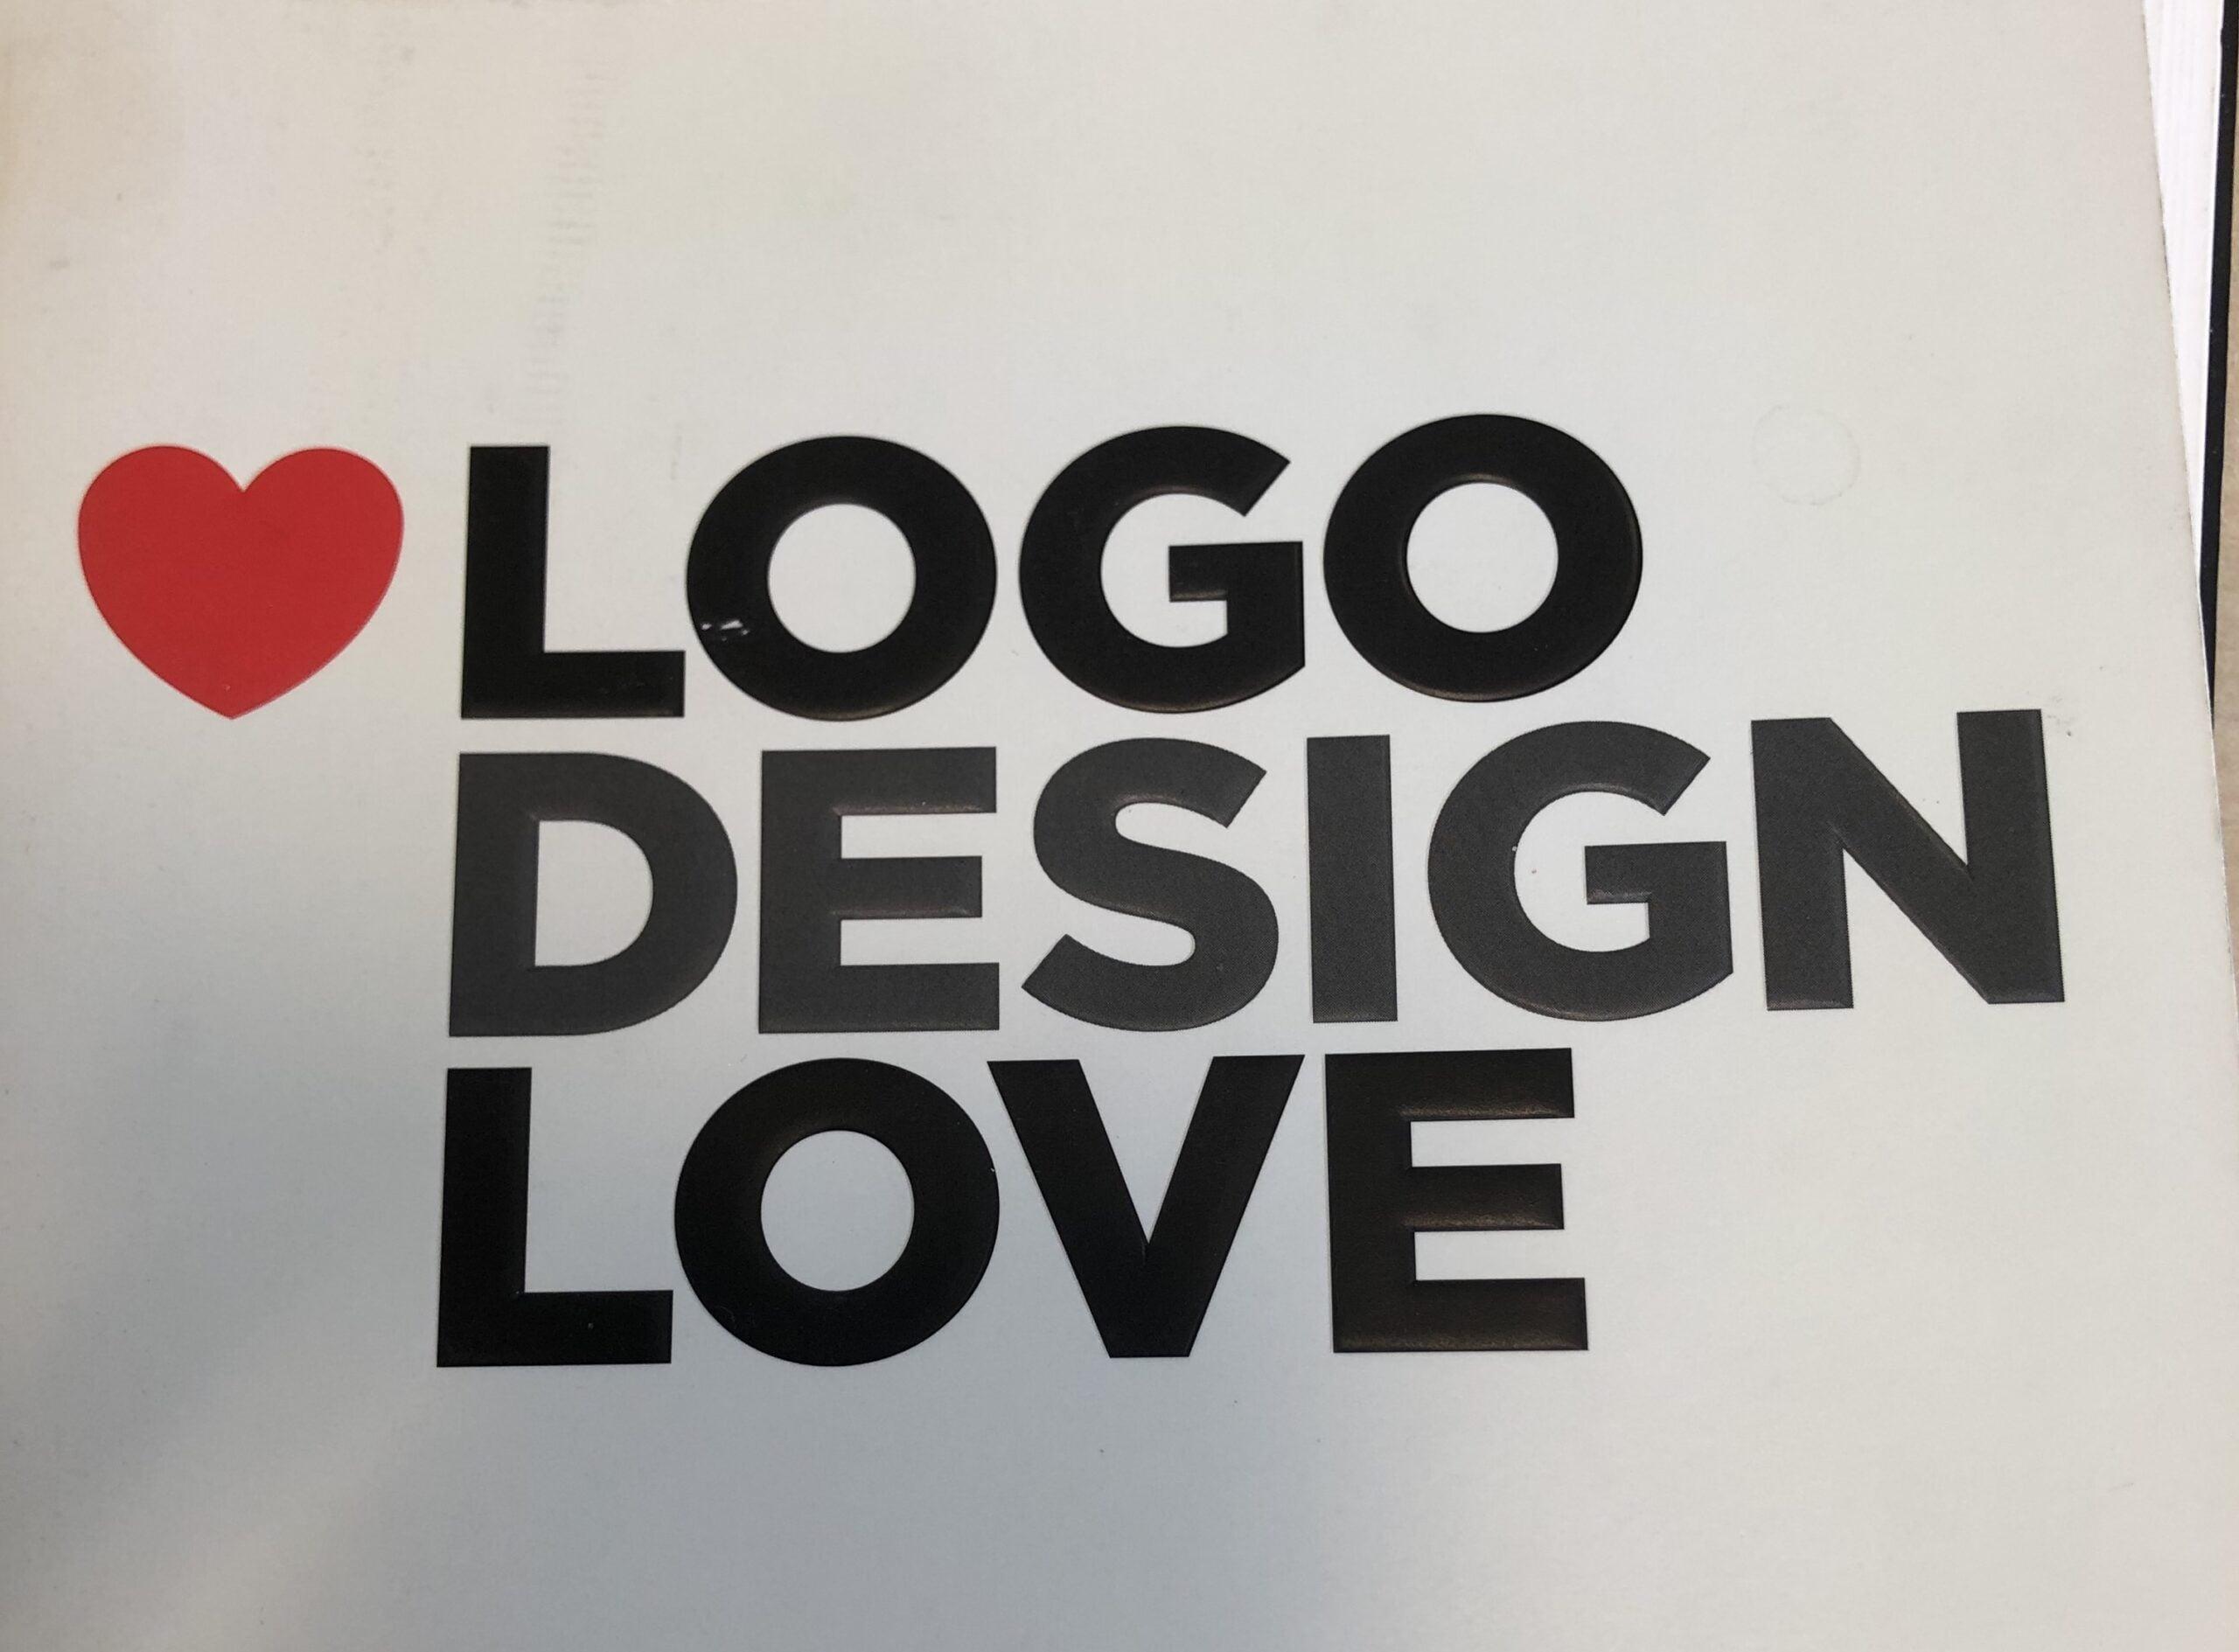 Logo design, logo refresh or logo redesign